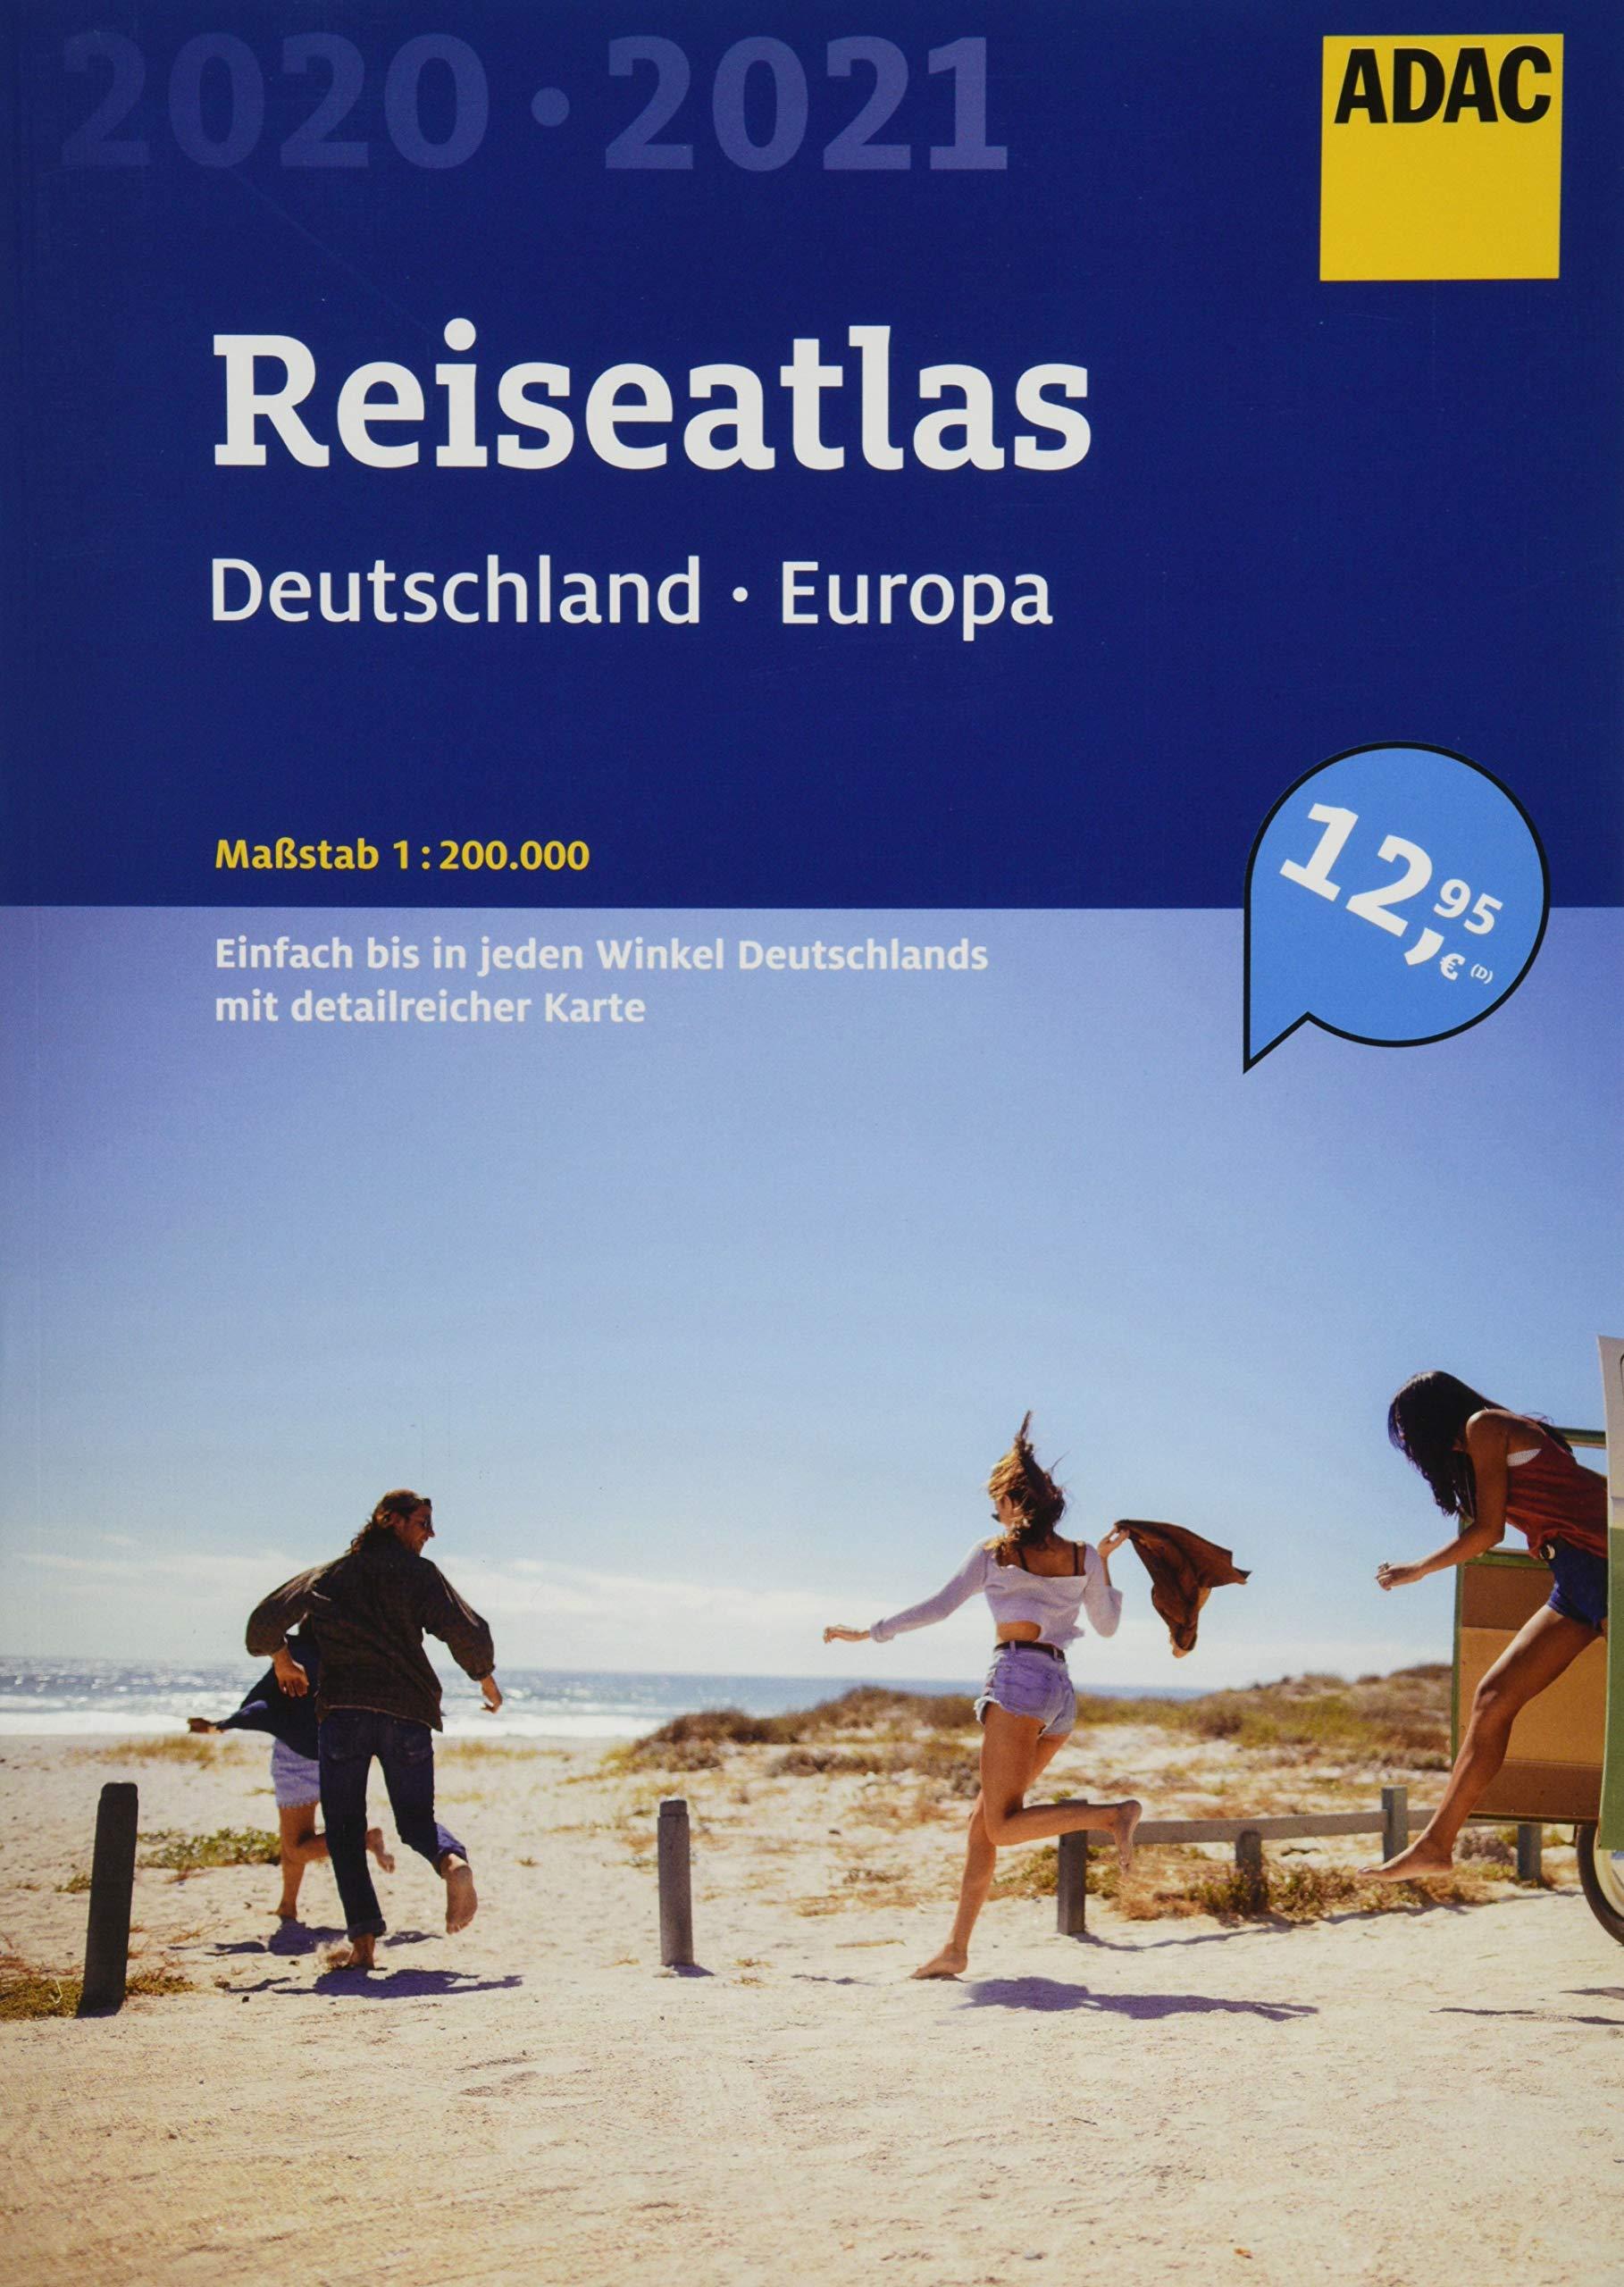 ADAC Reiseatlas Deutschland Europa 2020 2021 1 200 000  ADAC Atlanten